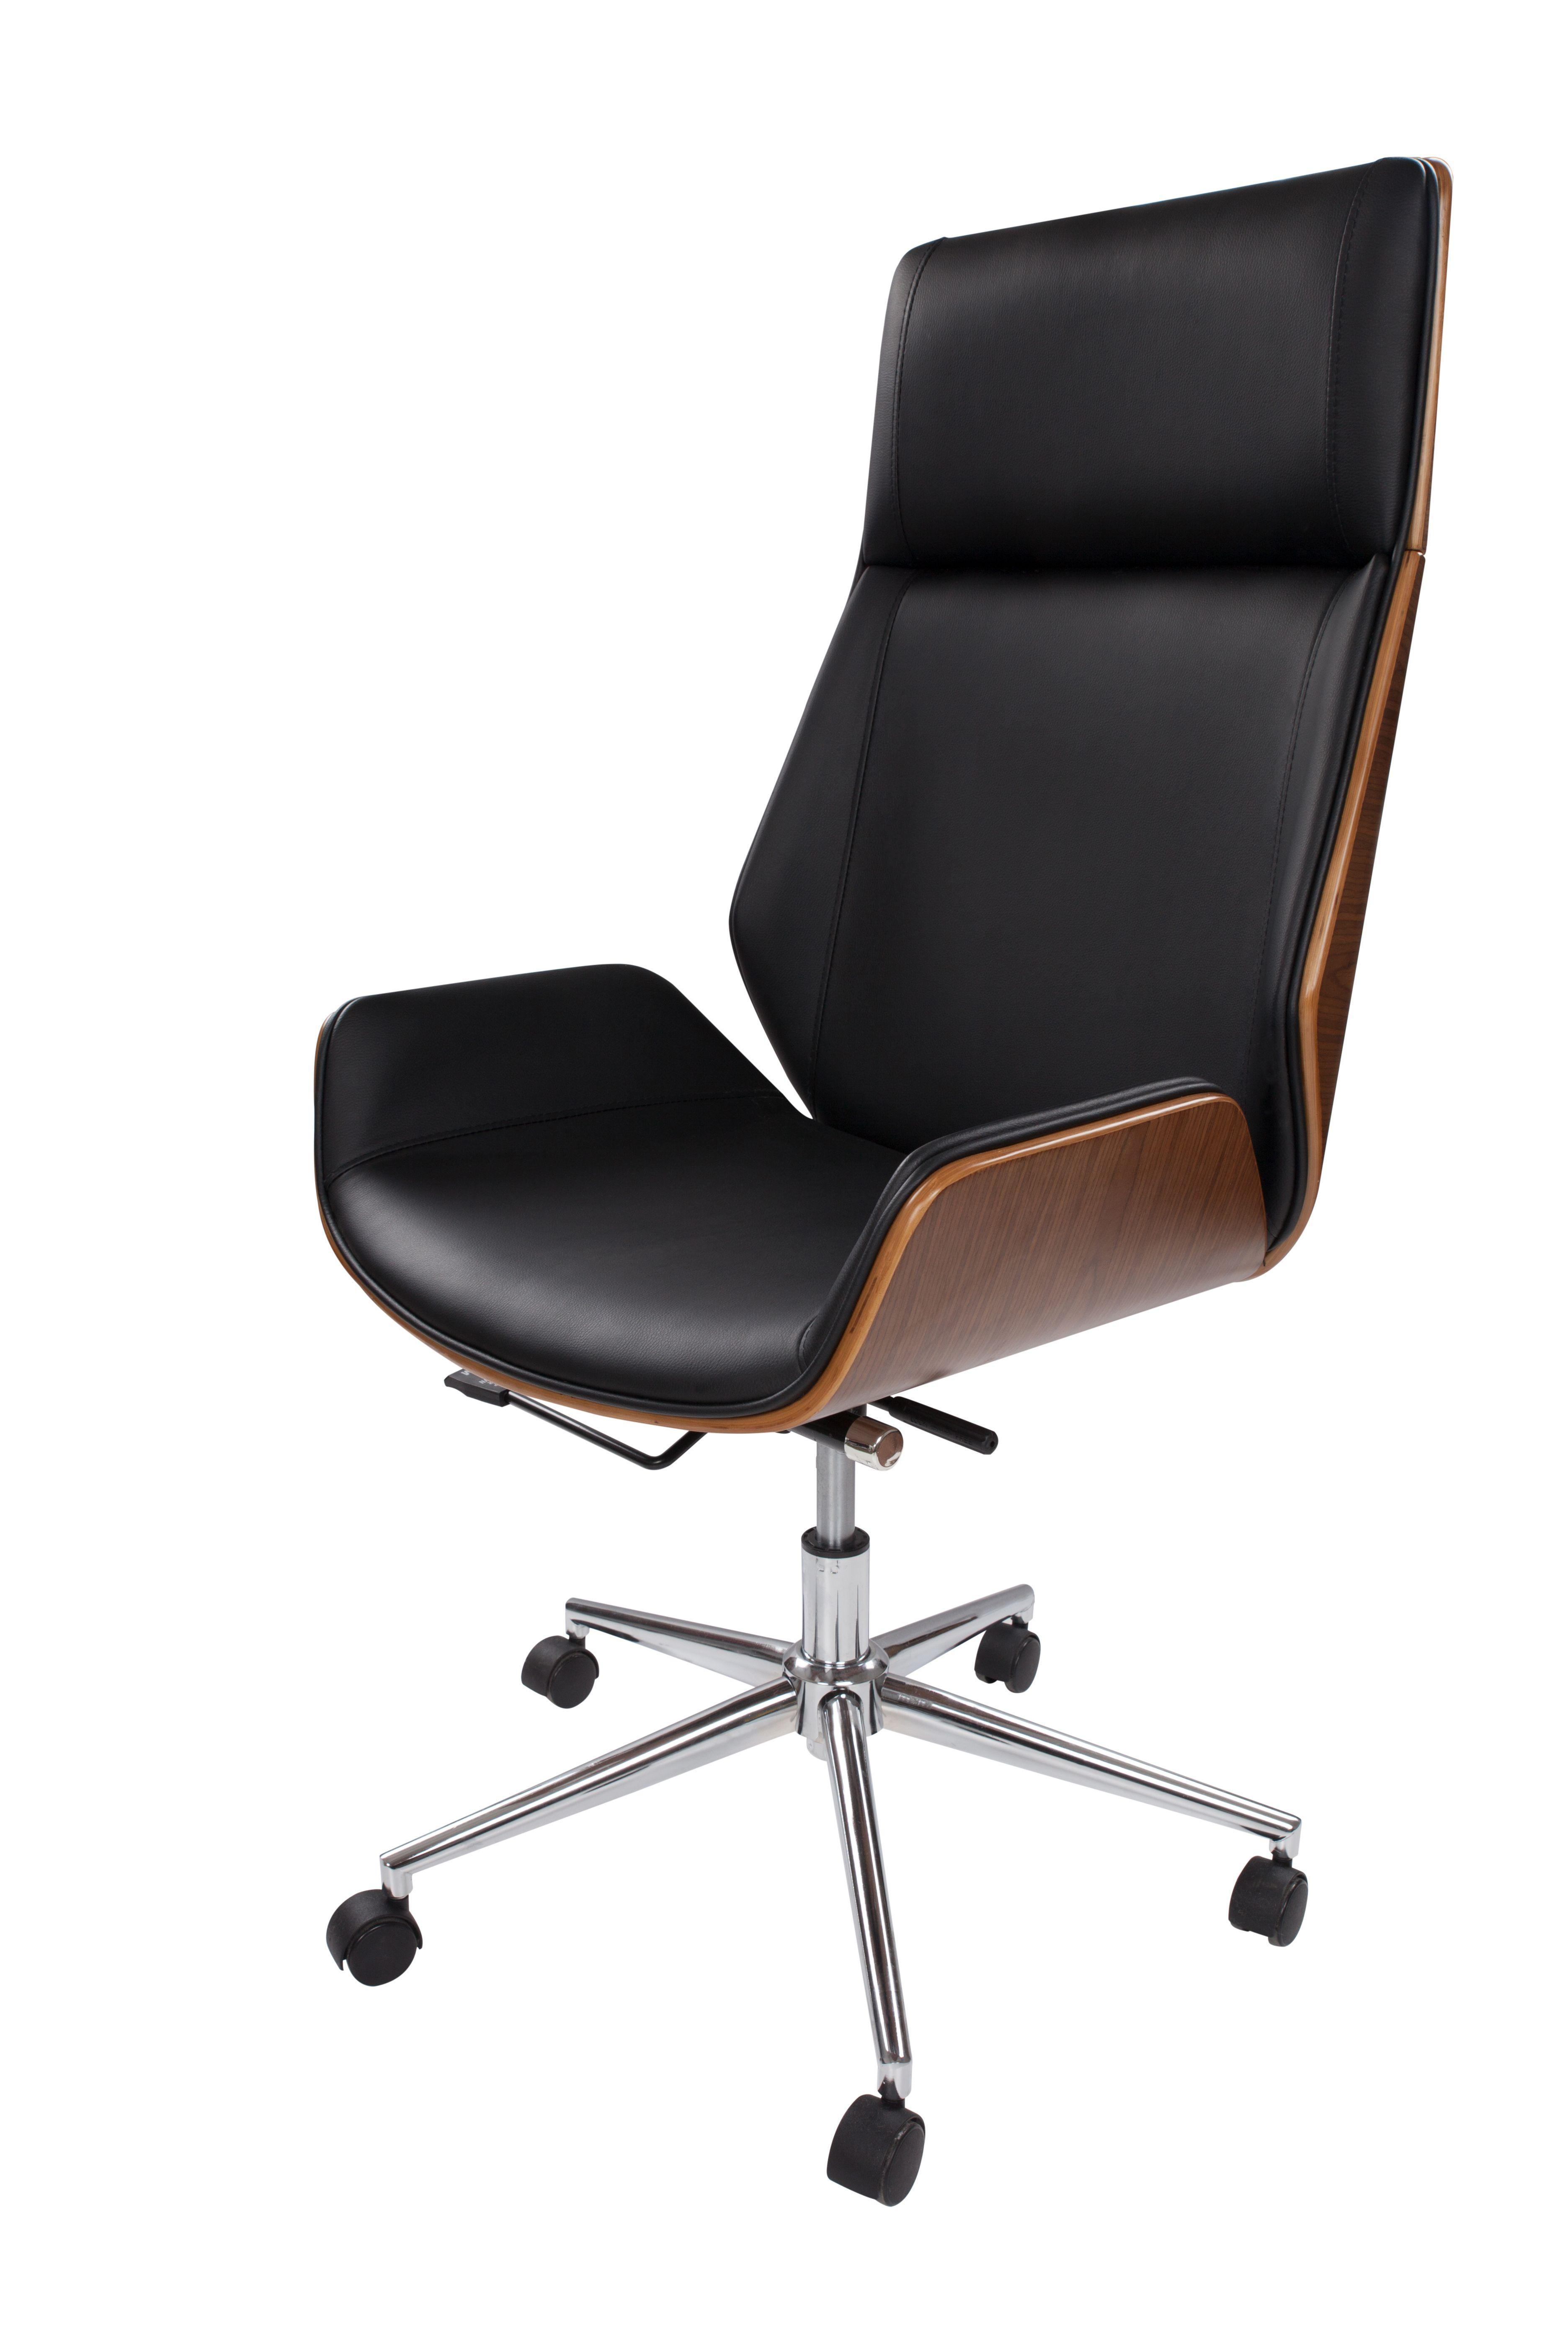 Bürostuhl Maleko 160 Schwarz | Bürostuhl, Online möbel, Stühle